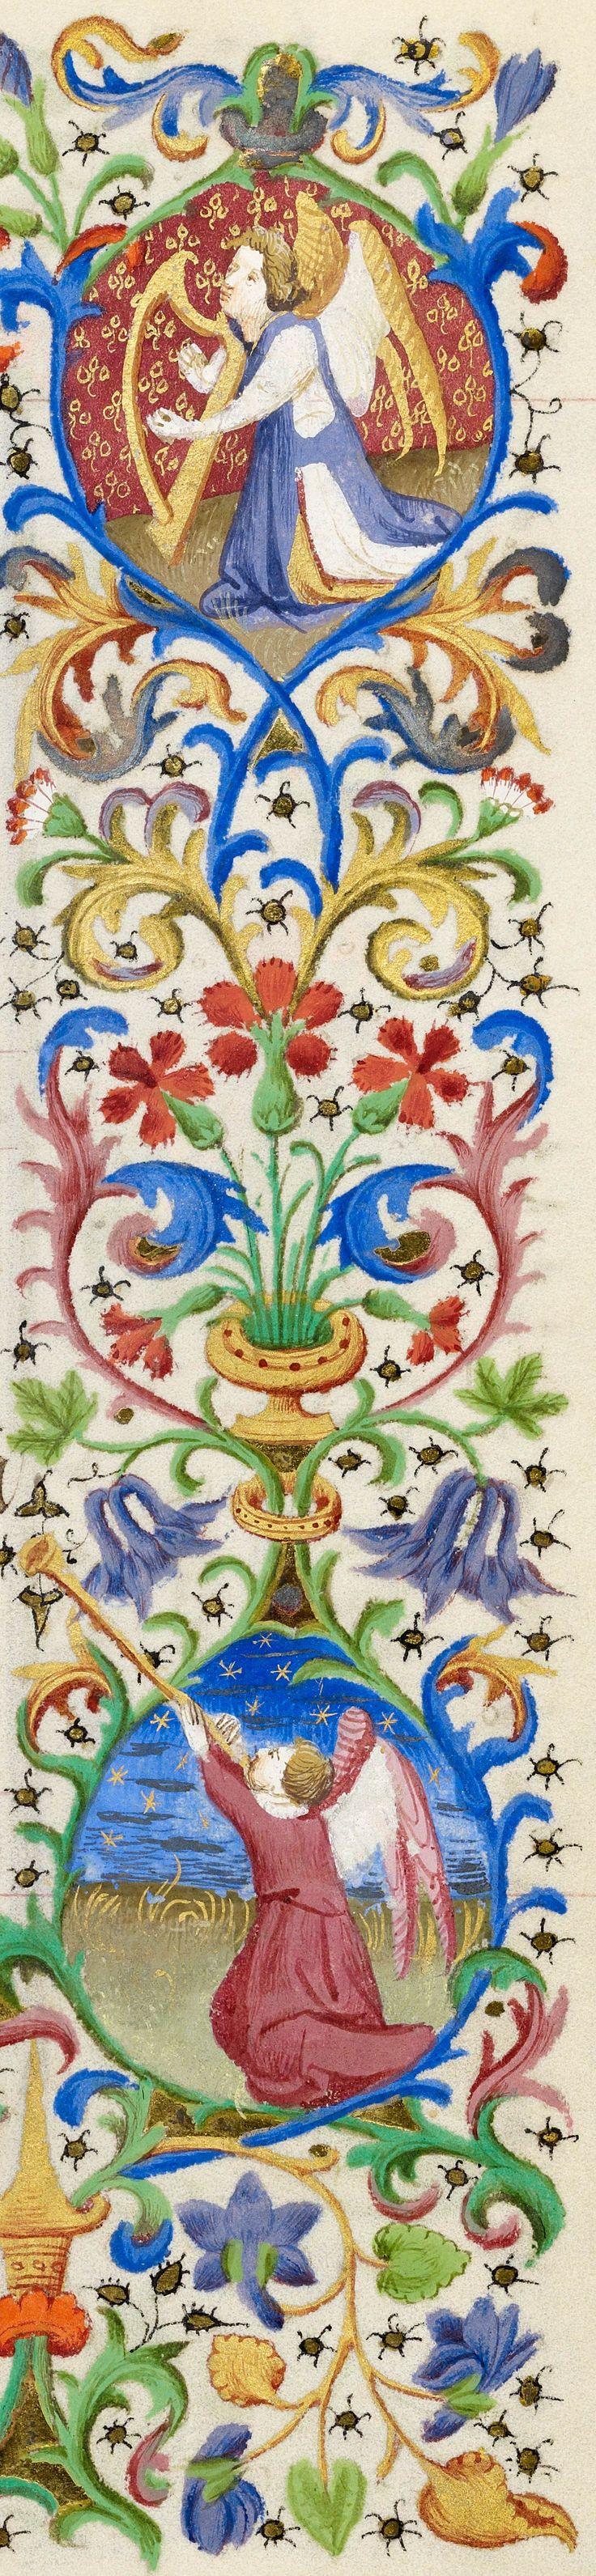 Kneeling angel playing harp (top) & Kneeling angel blowing straight trumpet (bottom) | Book of Hours | ca. 1425-1430 | The Morgan Library & Museum